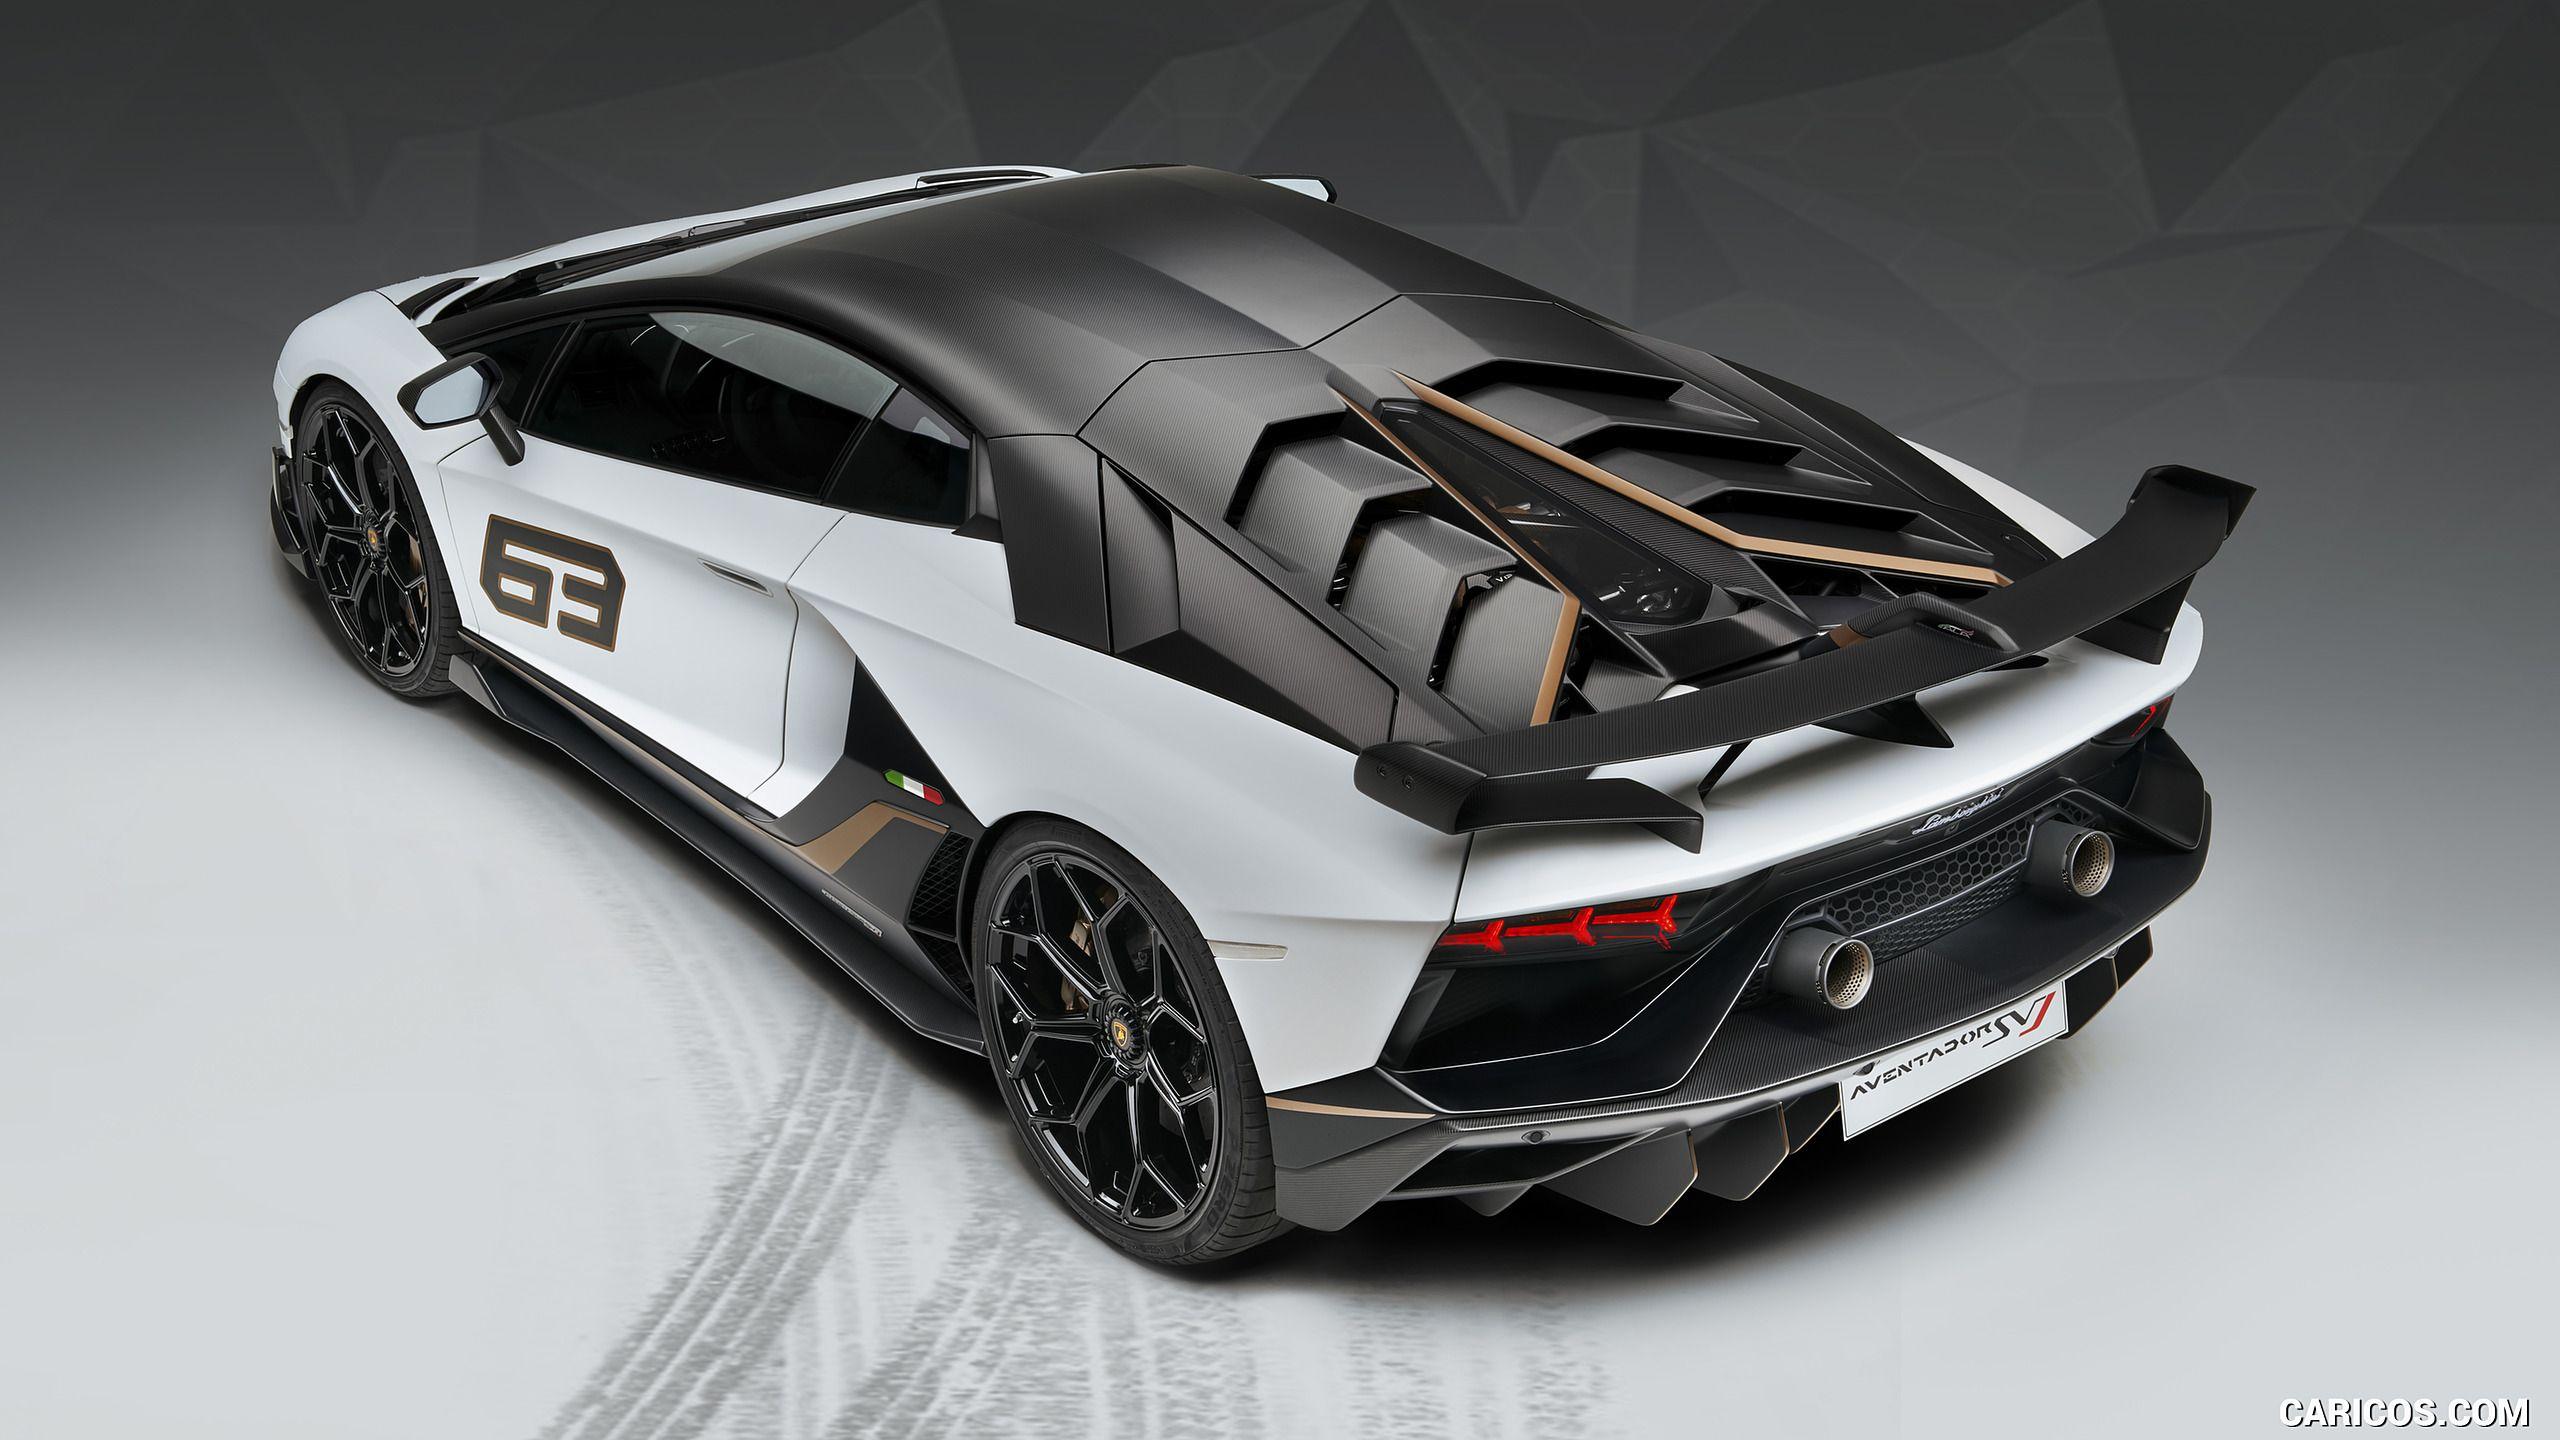 2019 Lamborghini Aventador Svj 람보르기니 아벤타도르 람보르기니 슈퍼카